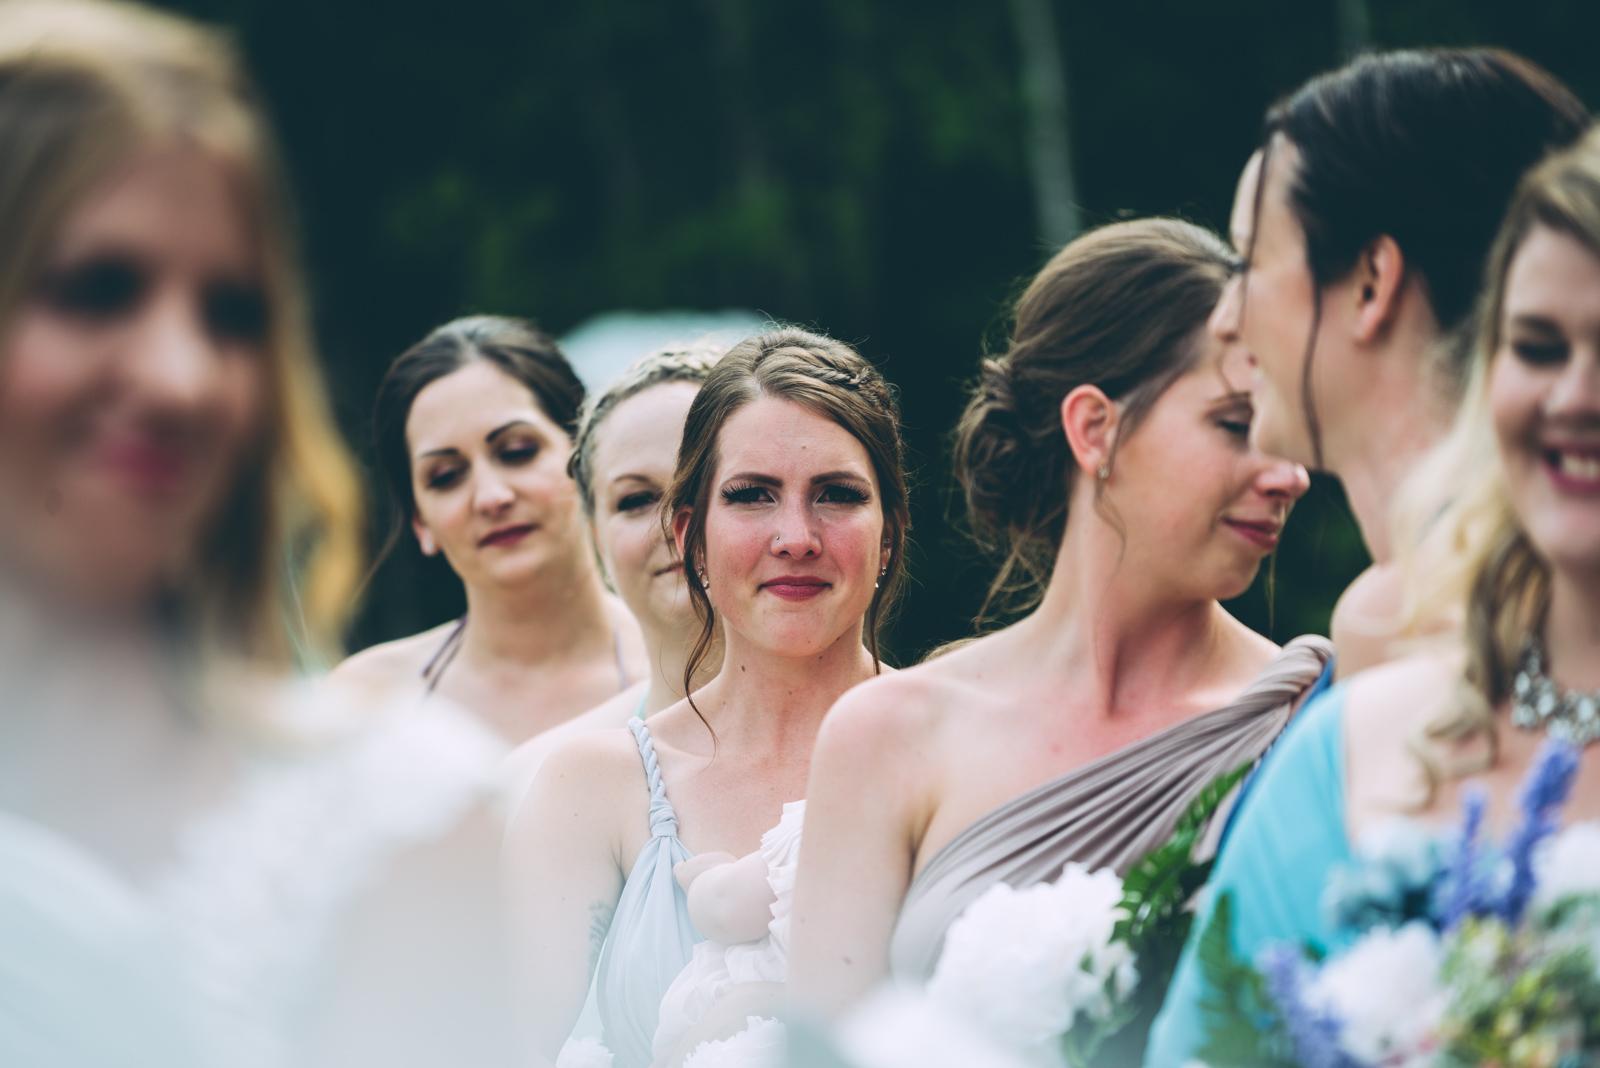 top-wedding-photos-2018-blog-31.jpg